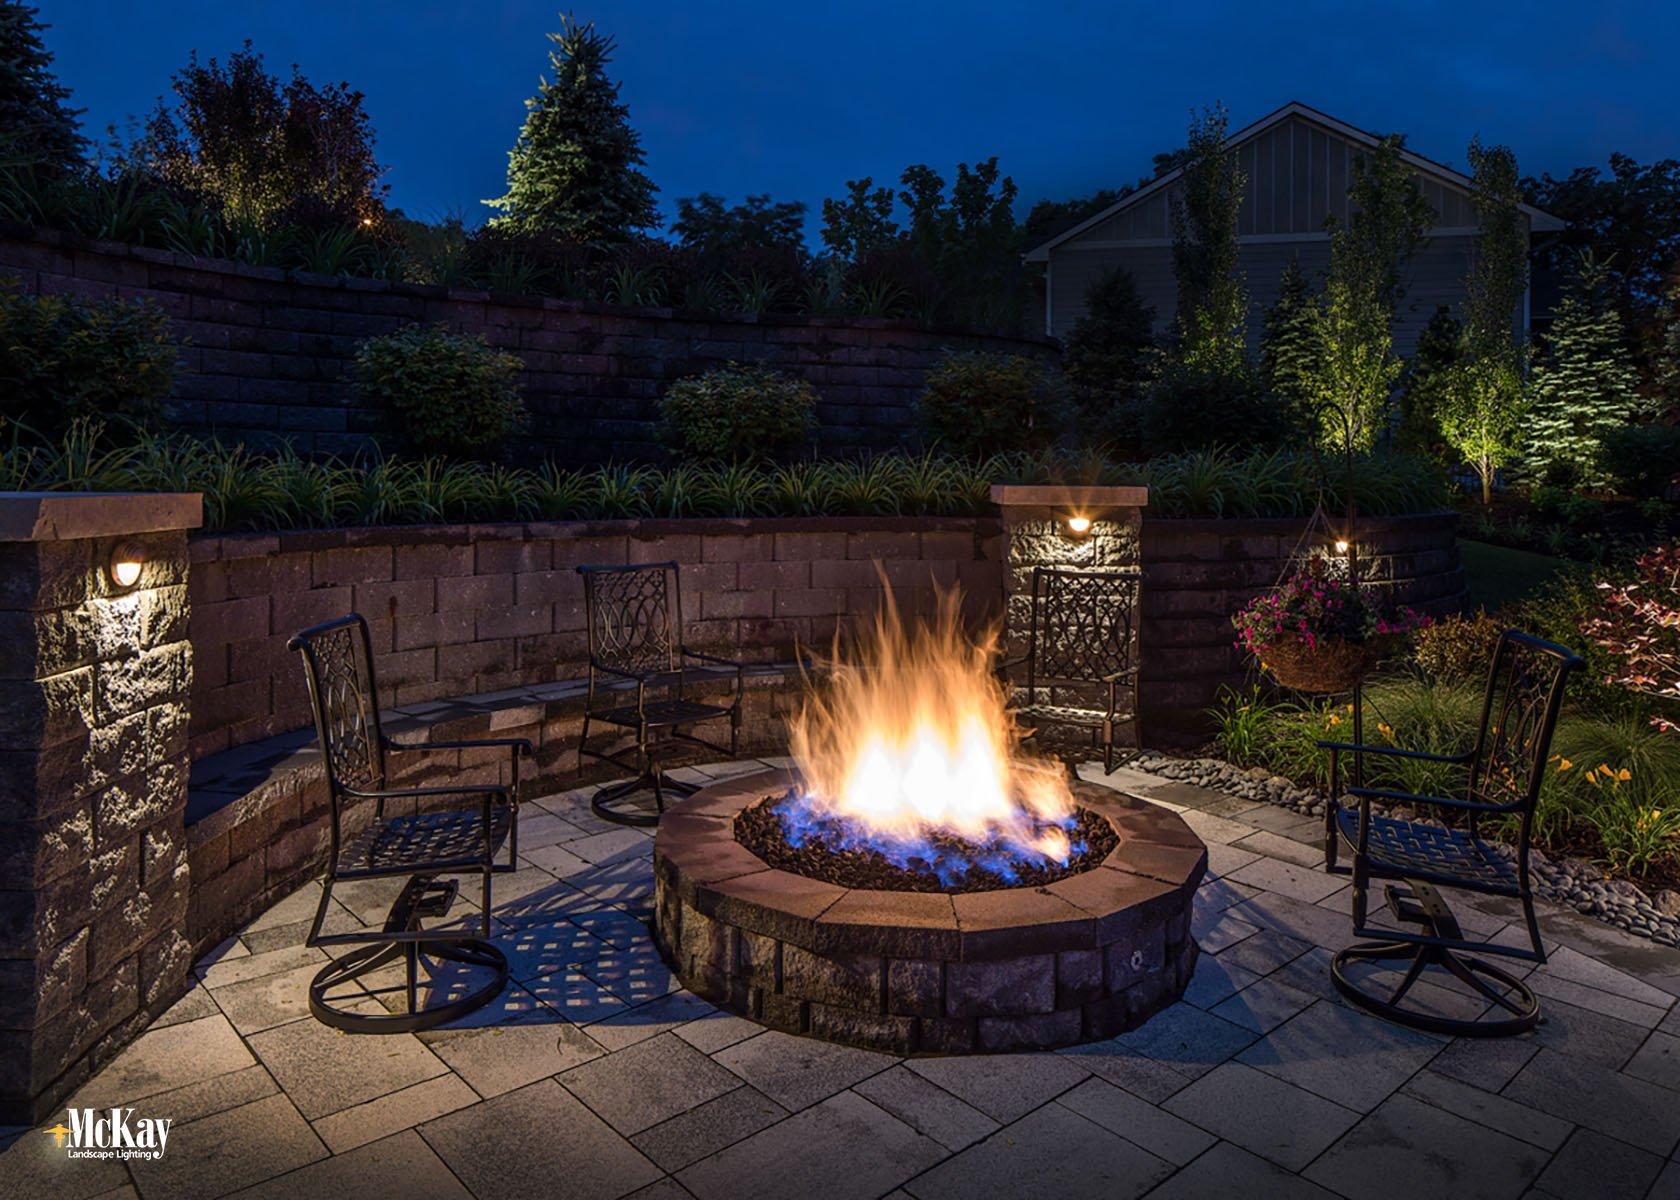 Outdoor Fire Pit Lighting Omaha Nebraska McKay Landscape Lighting S 11